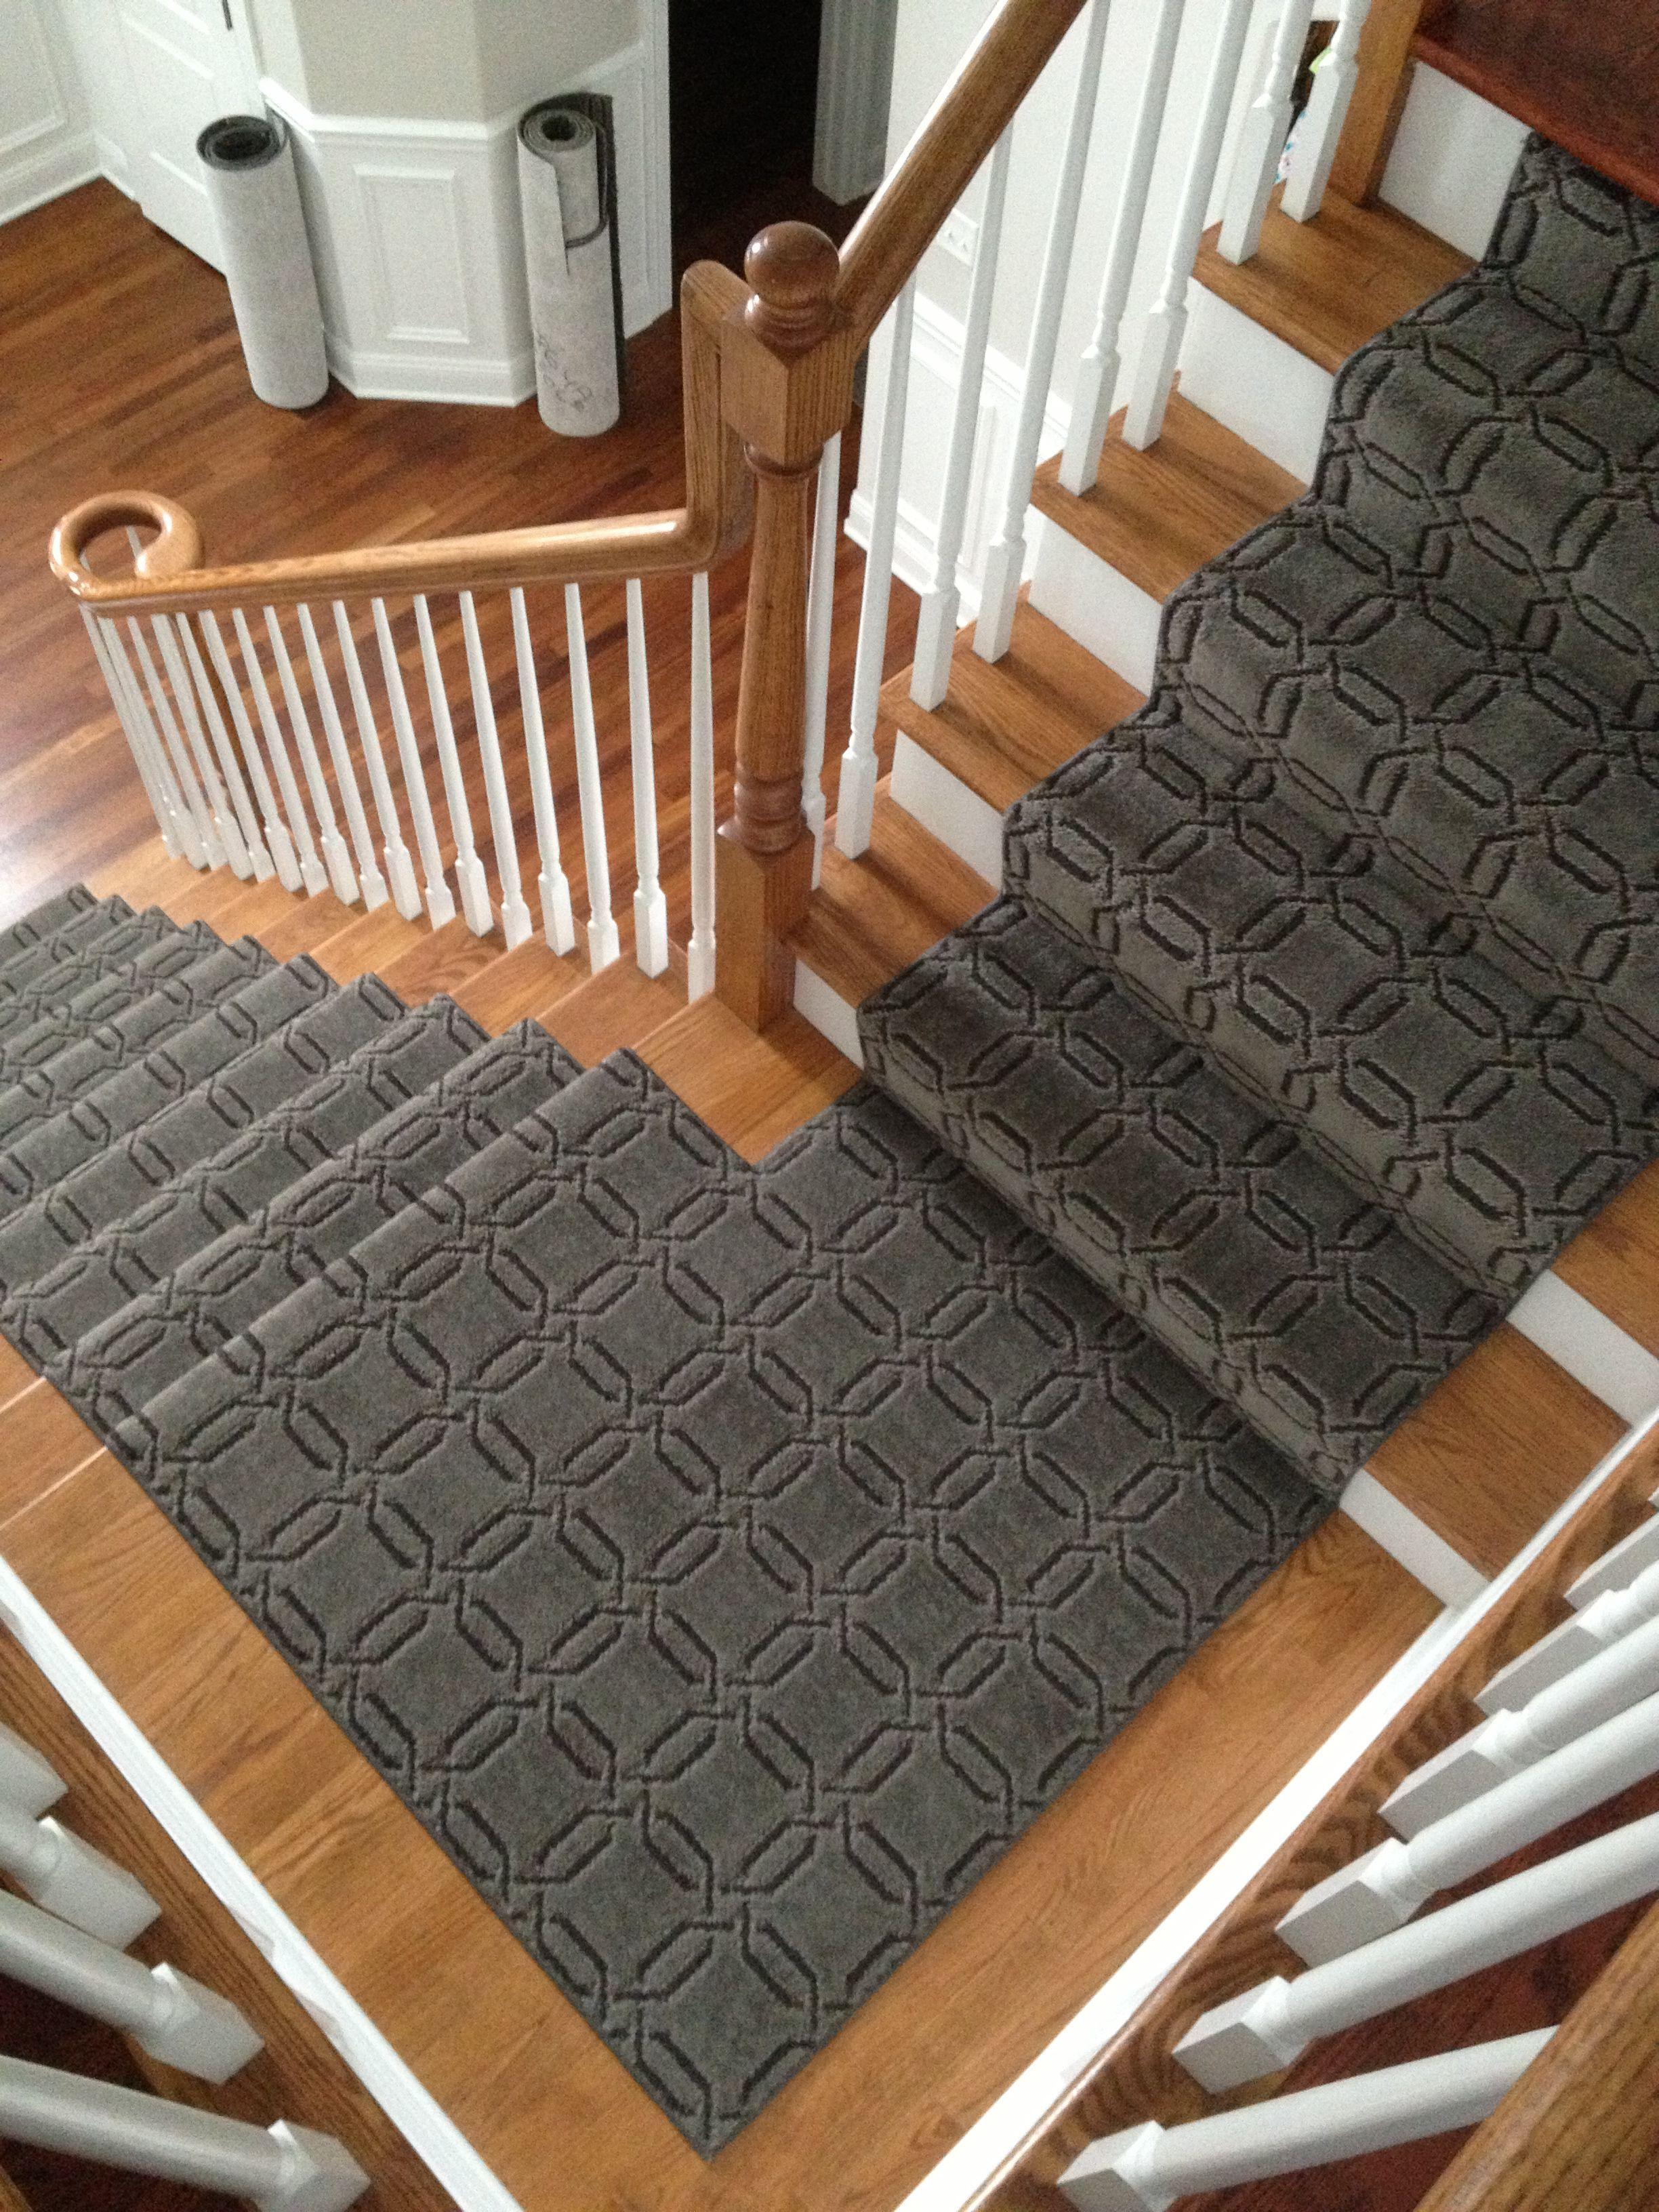 Pin On Stair Runners   Traditional Stair Carpet Runners   Bespoke   Patterned   Modern   Stair Landing   Dark Stain